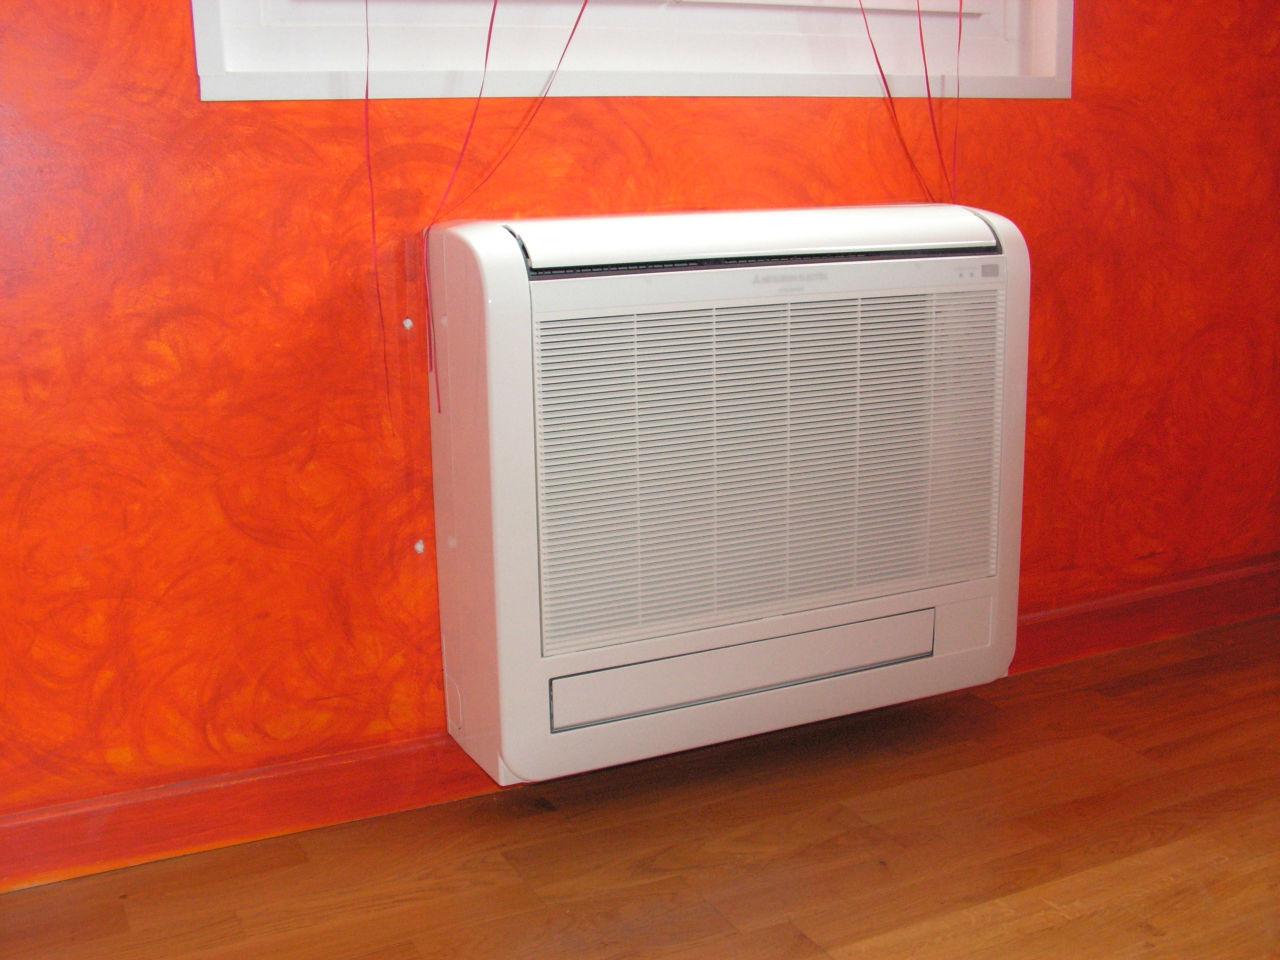 chauffage clim reversible chauffage climatiseur reversible climatiseur r versible whirlpool. Black Bedroom Furniture Sets. Home Design Ideas